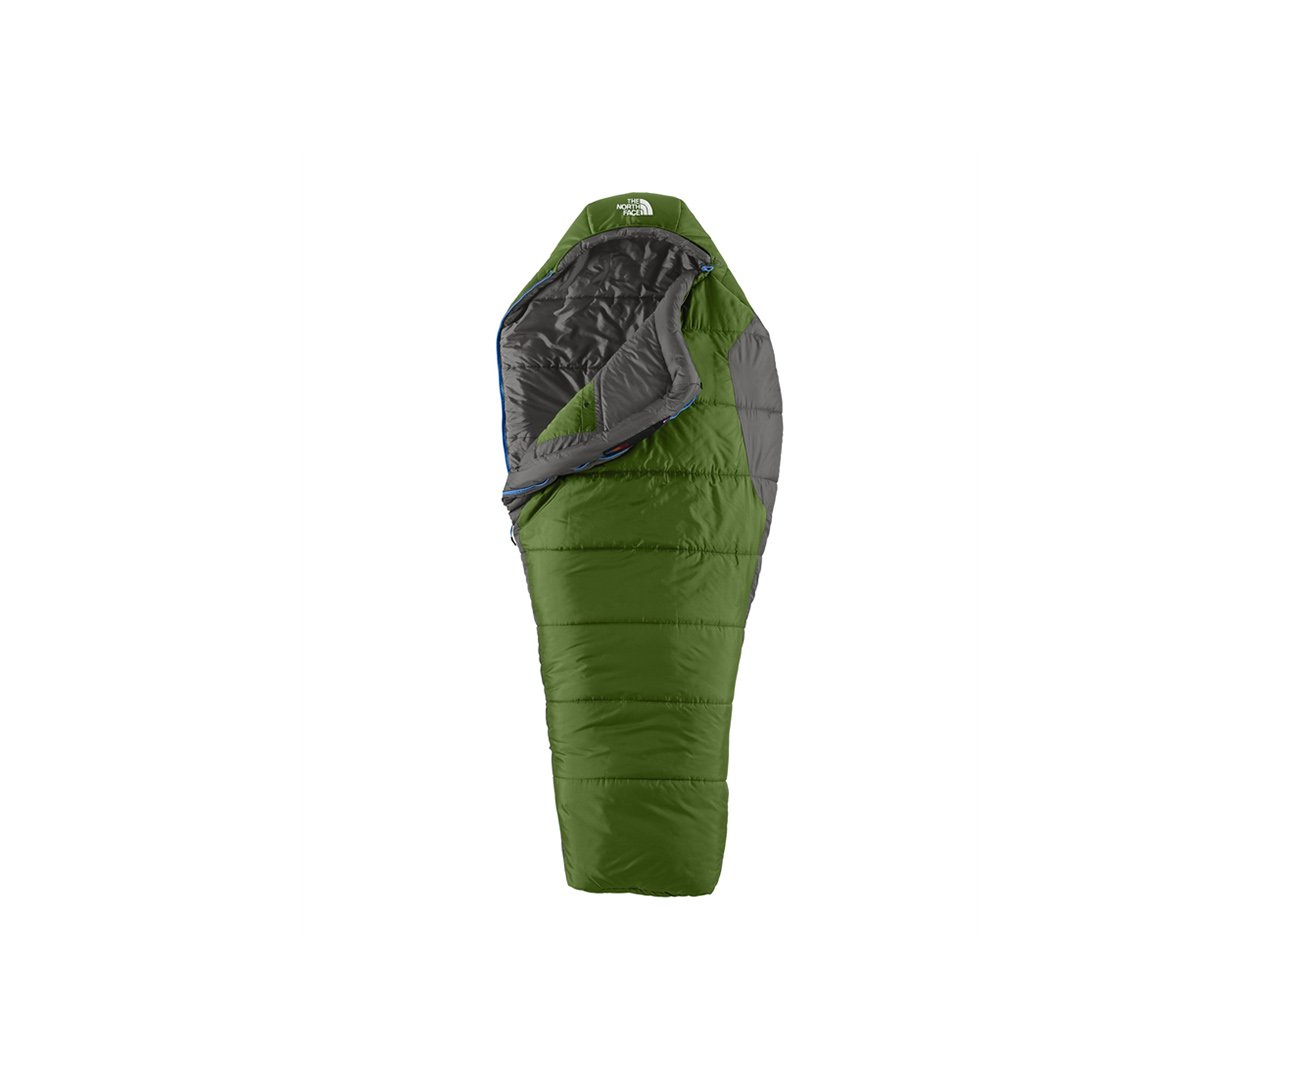 Saco De Dormir Aleutian 4s Bx Verde/cinza 0 °c Ziper Lado Direito - The North Face